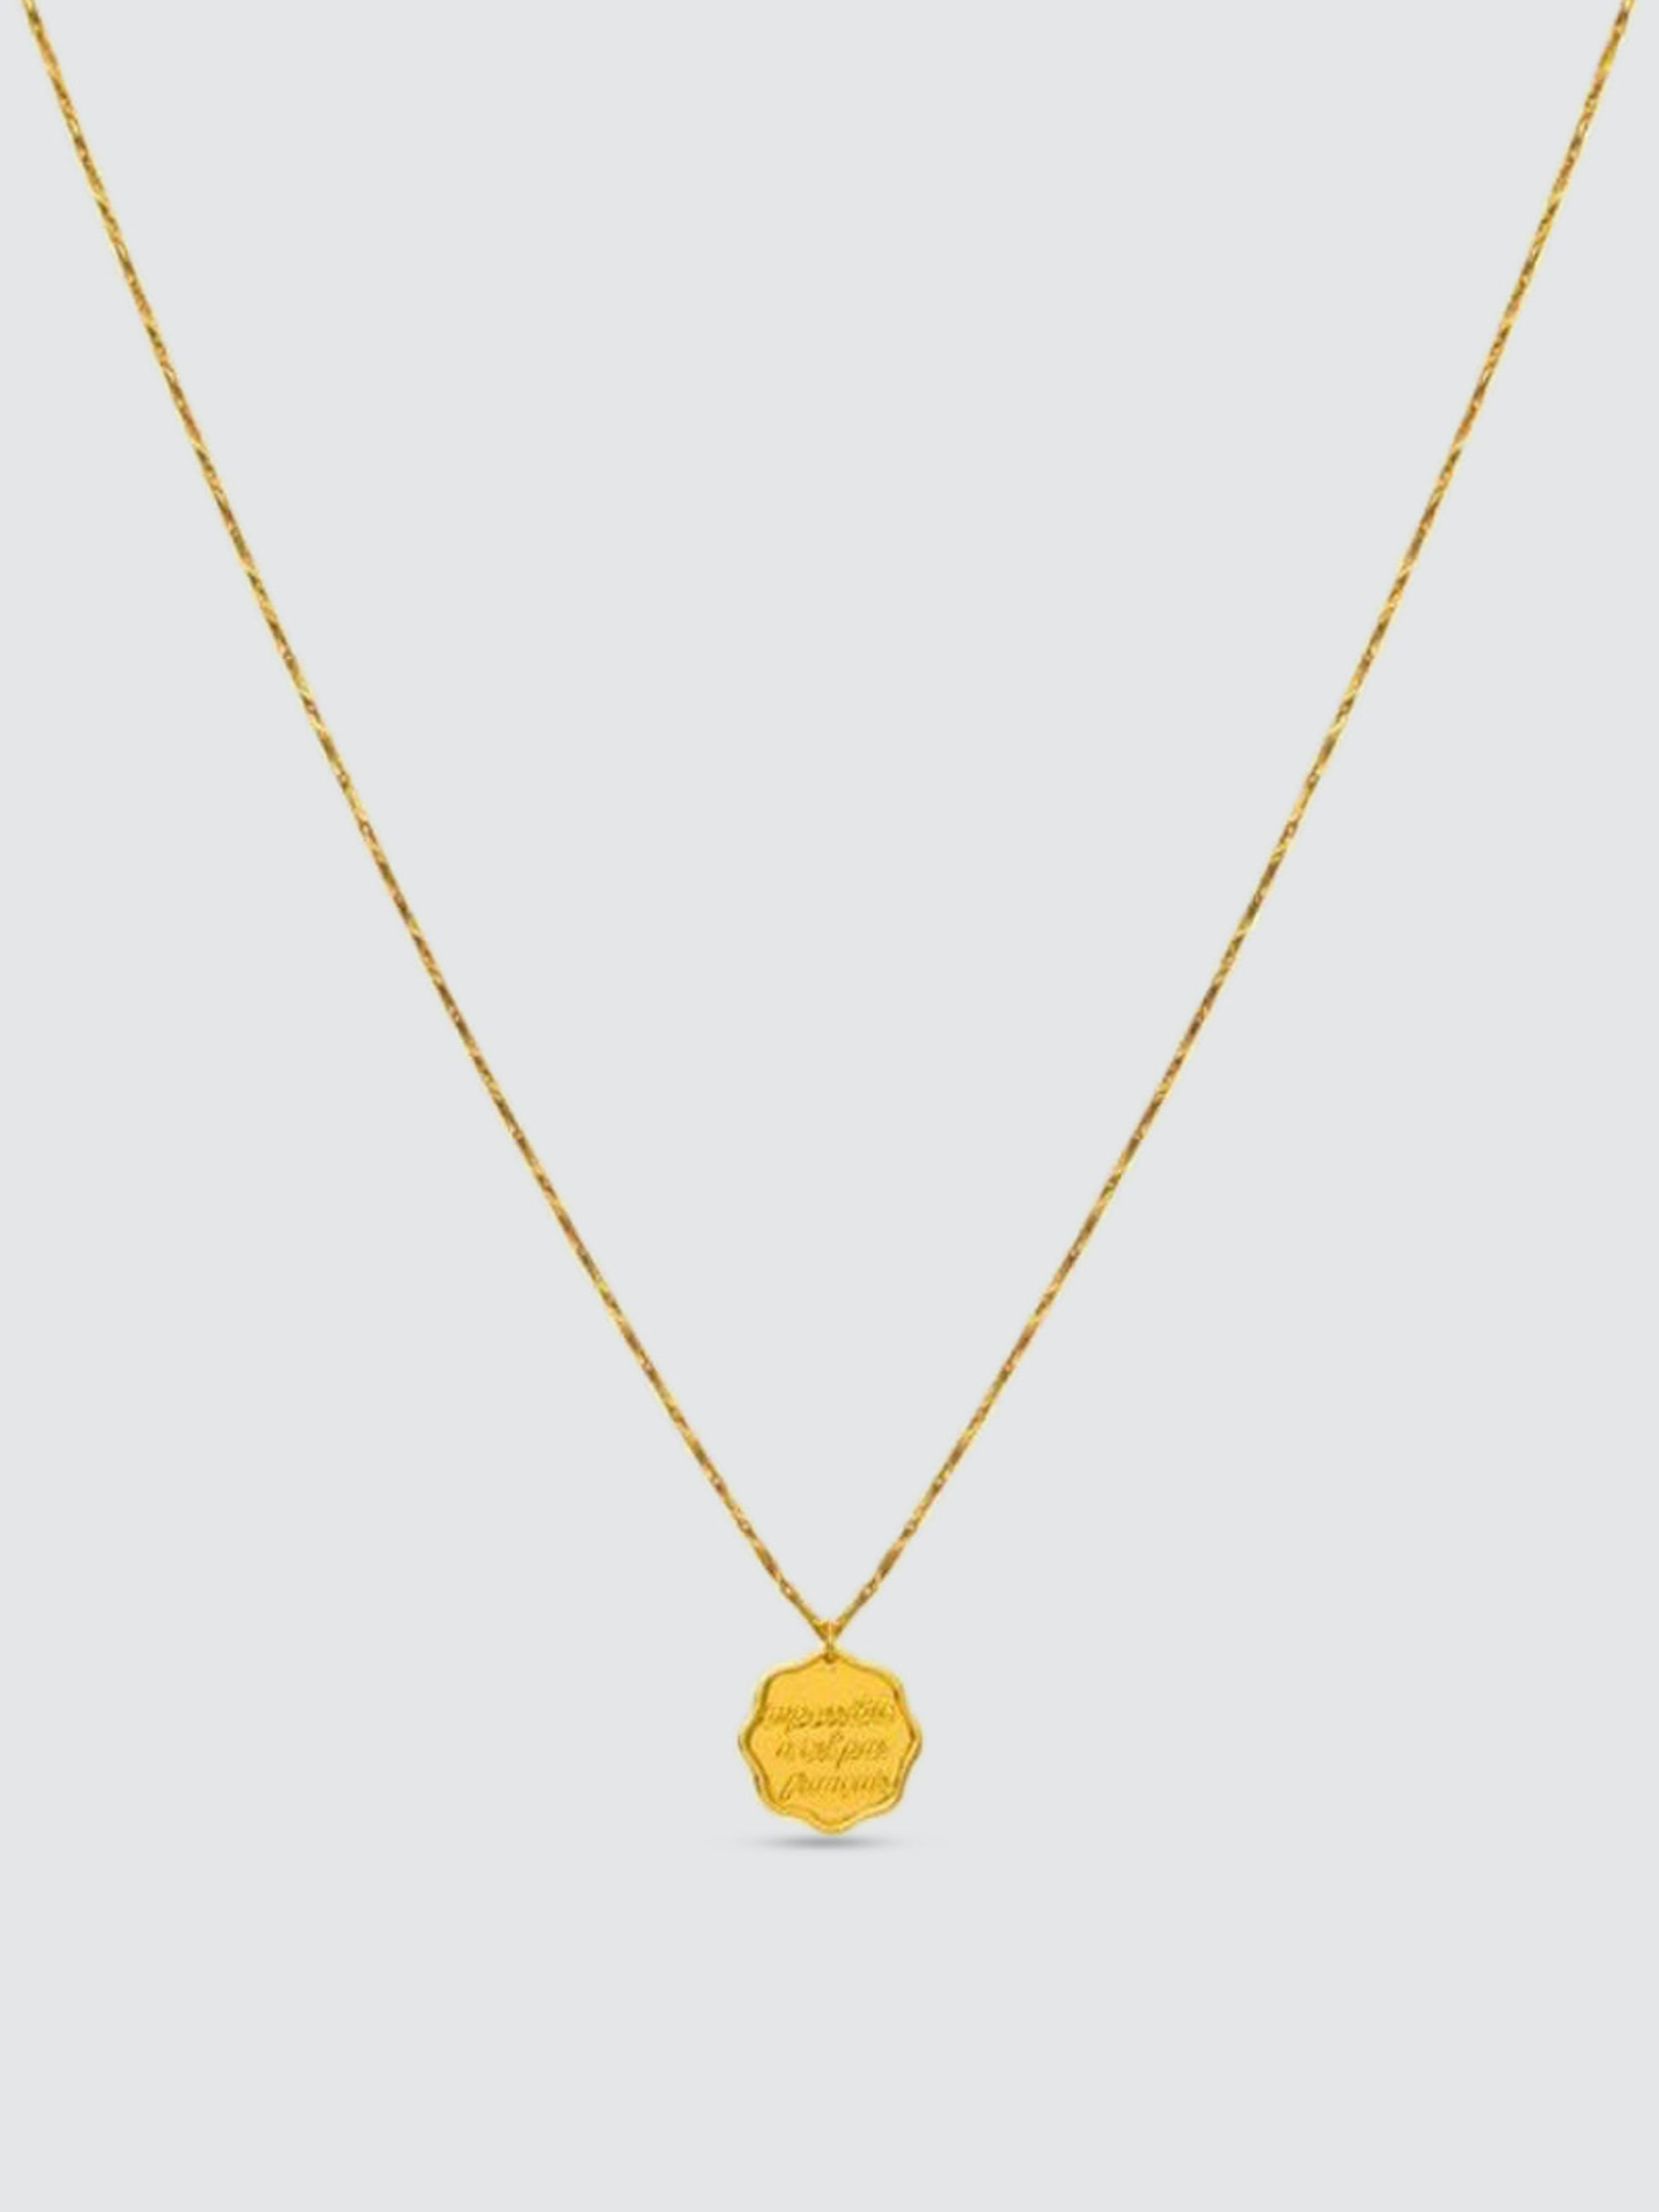 Jonesy Wood Impossible N'est Pas Francais In Gold